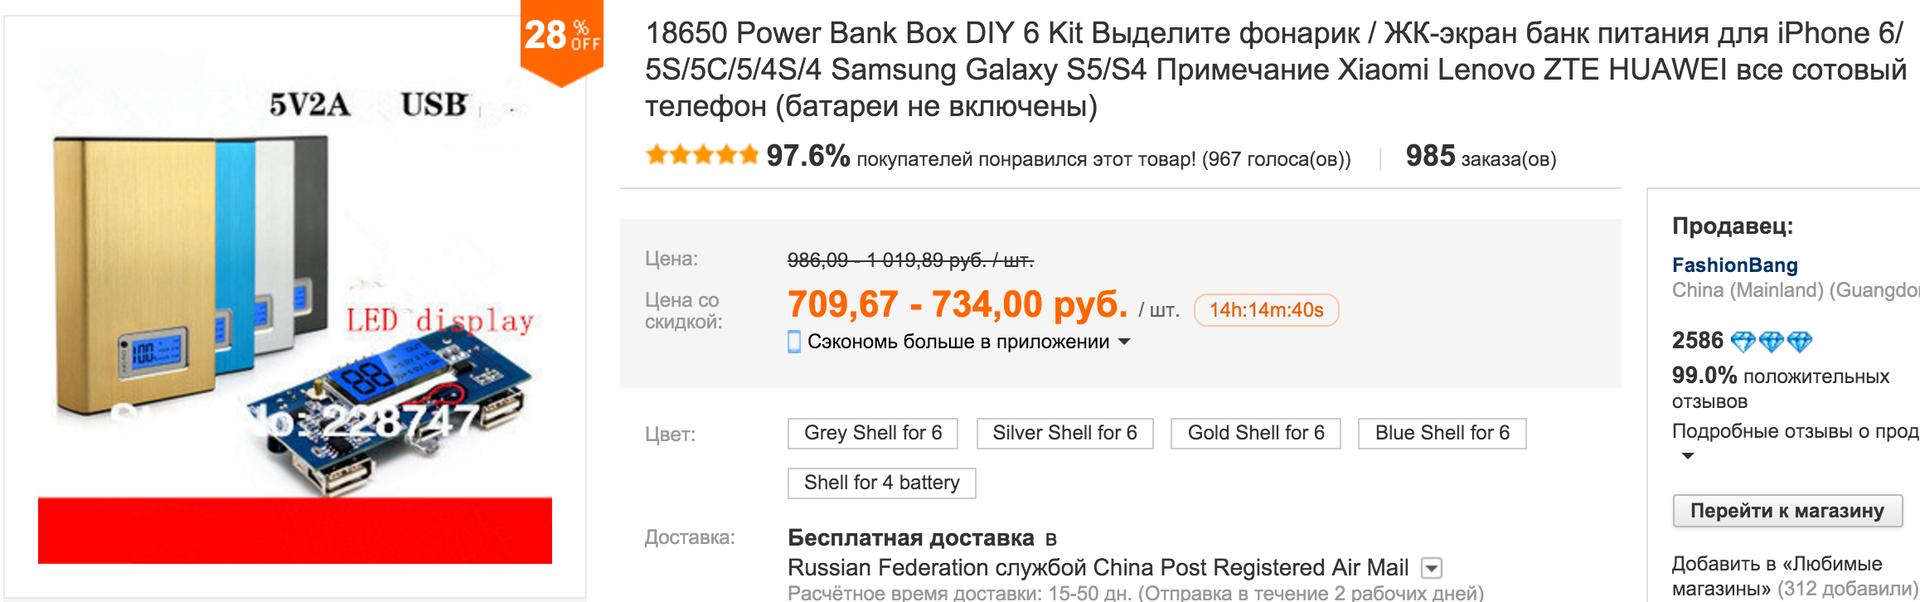 DIY PowerBank на 17000 честных миллиампер-часов - 3